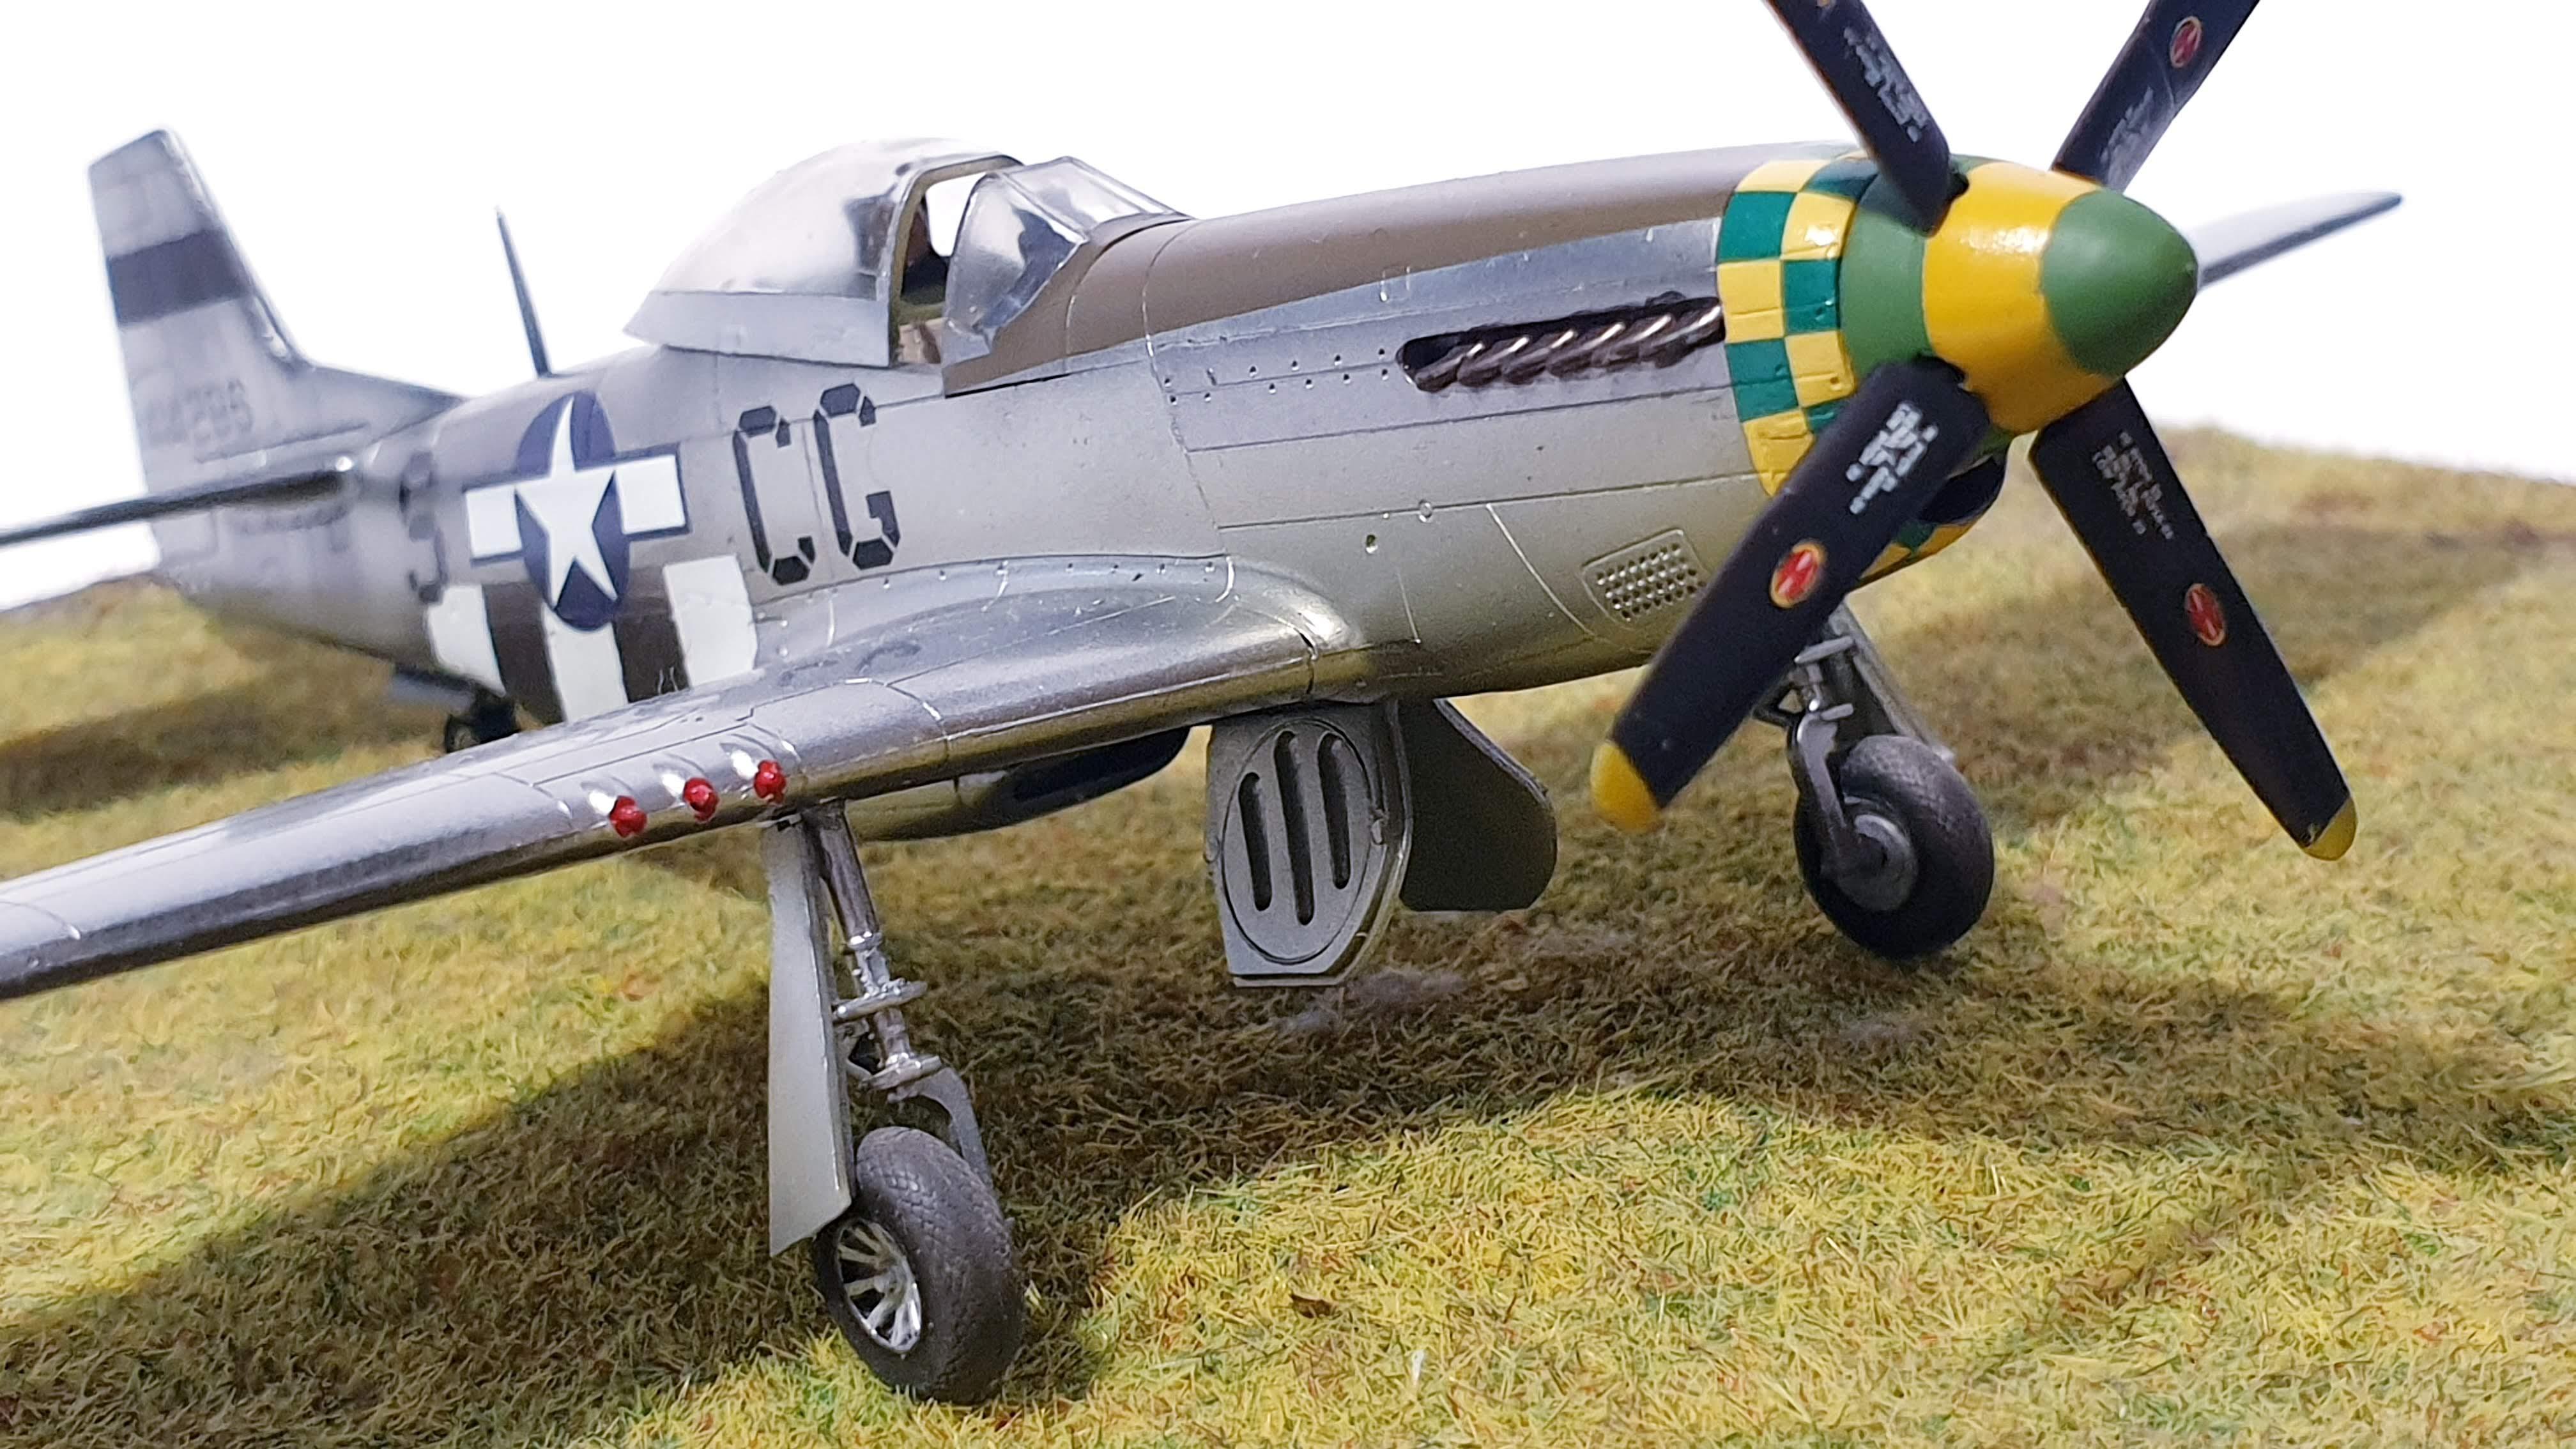 [Airfix] P-51D Mustang Tennessee Belle 20200918_155928